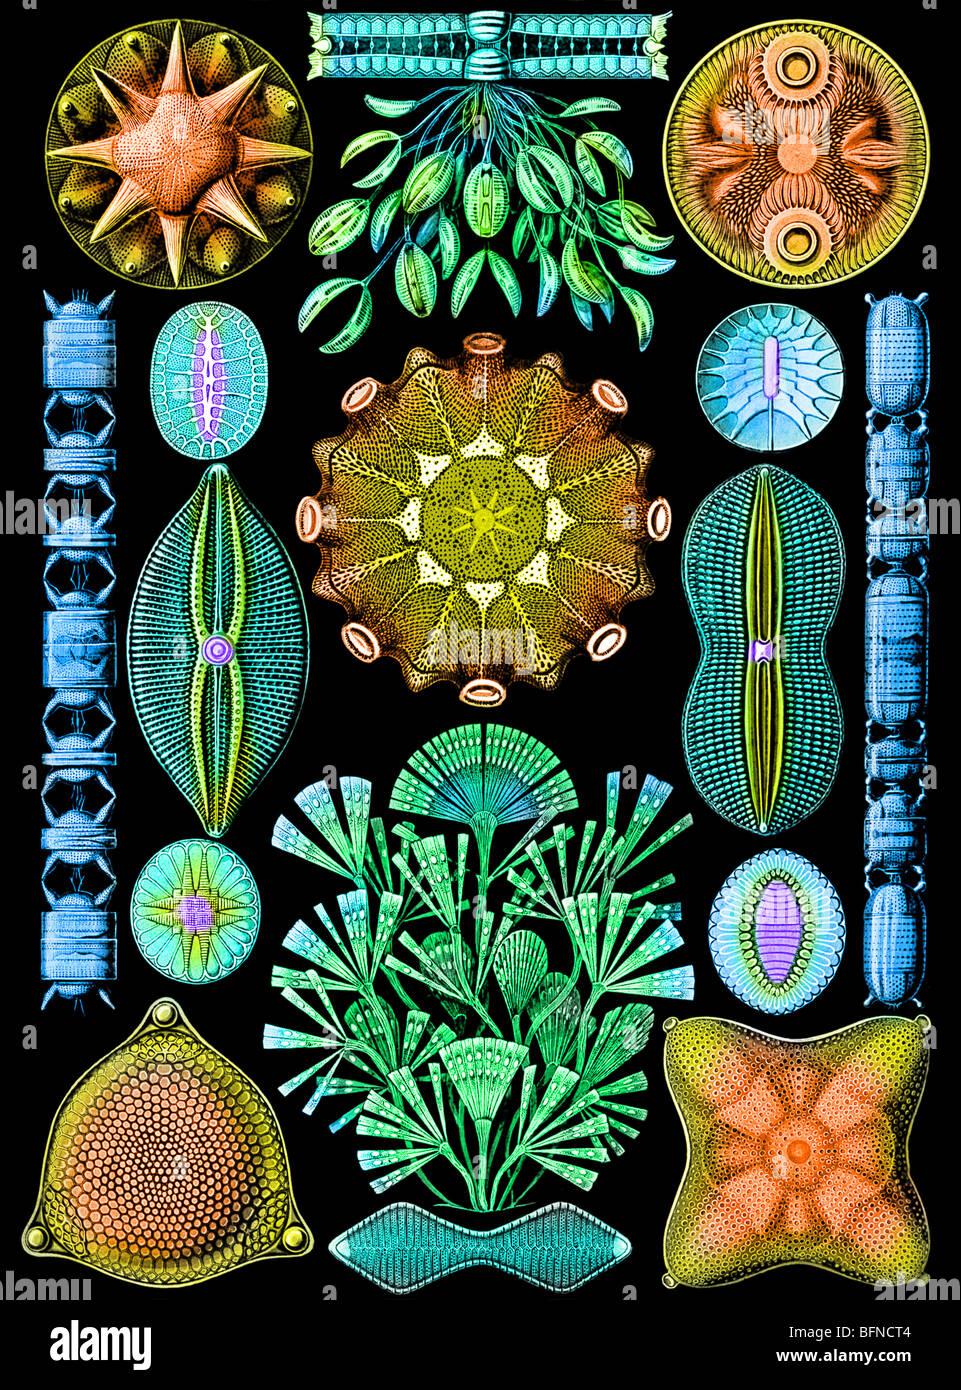 La piastra 84da Ernst Haeckel's Kunstformen der Natur (1904), raffigurante diatomee (Diatomea). Immagini Stock